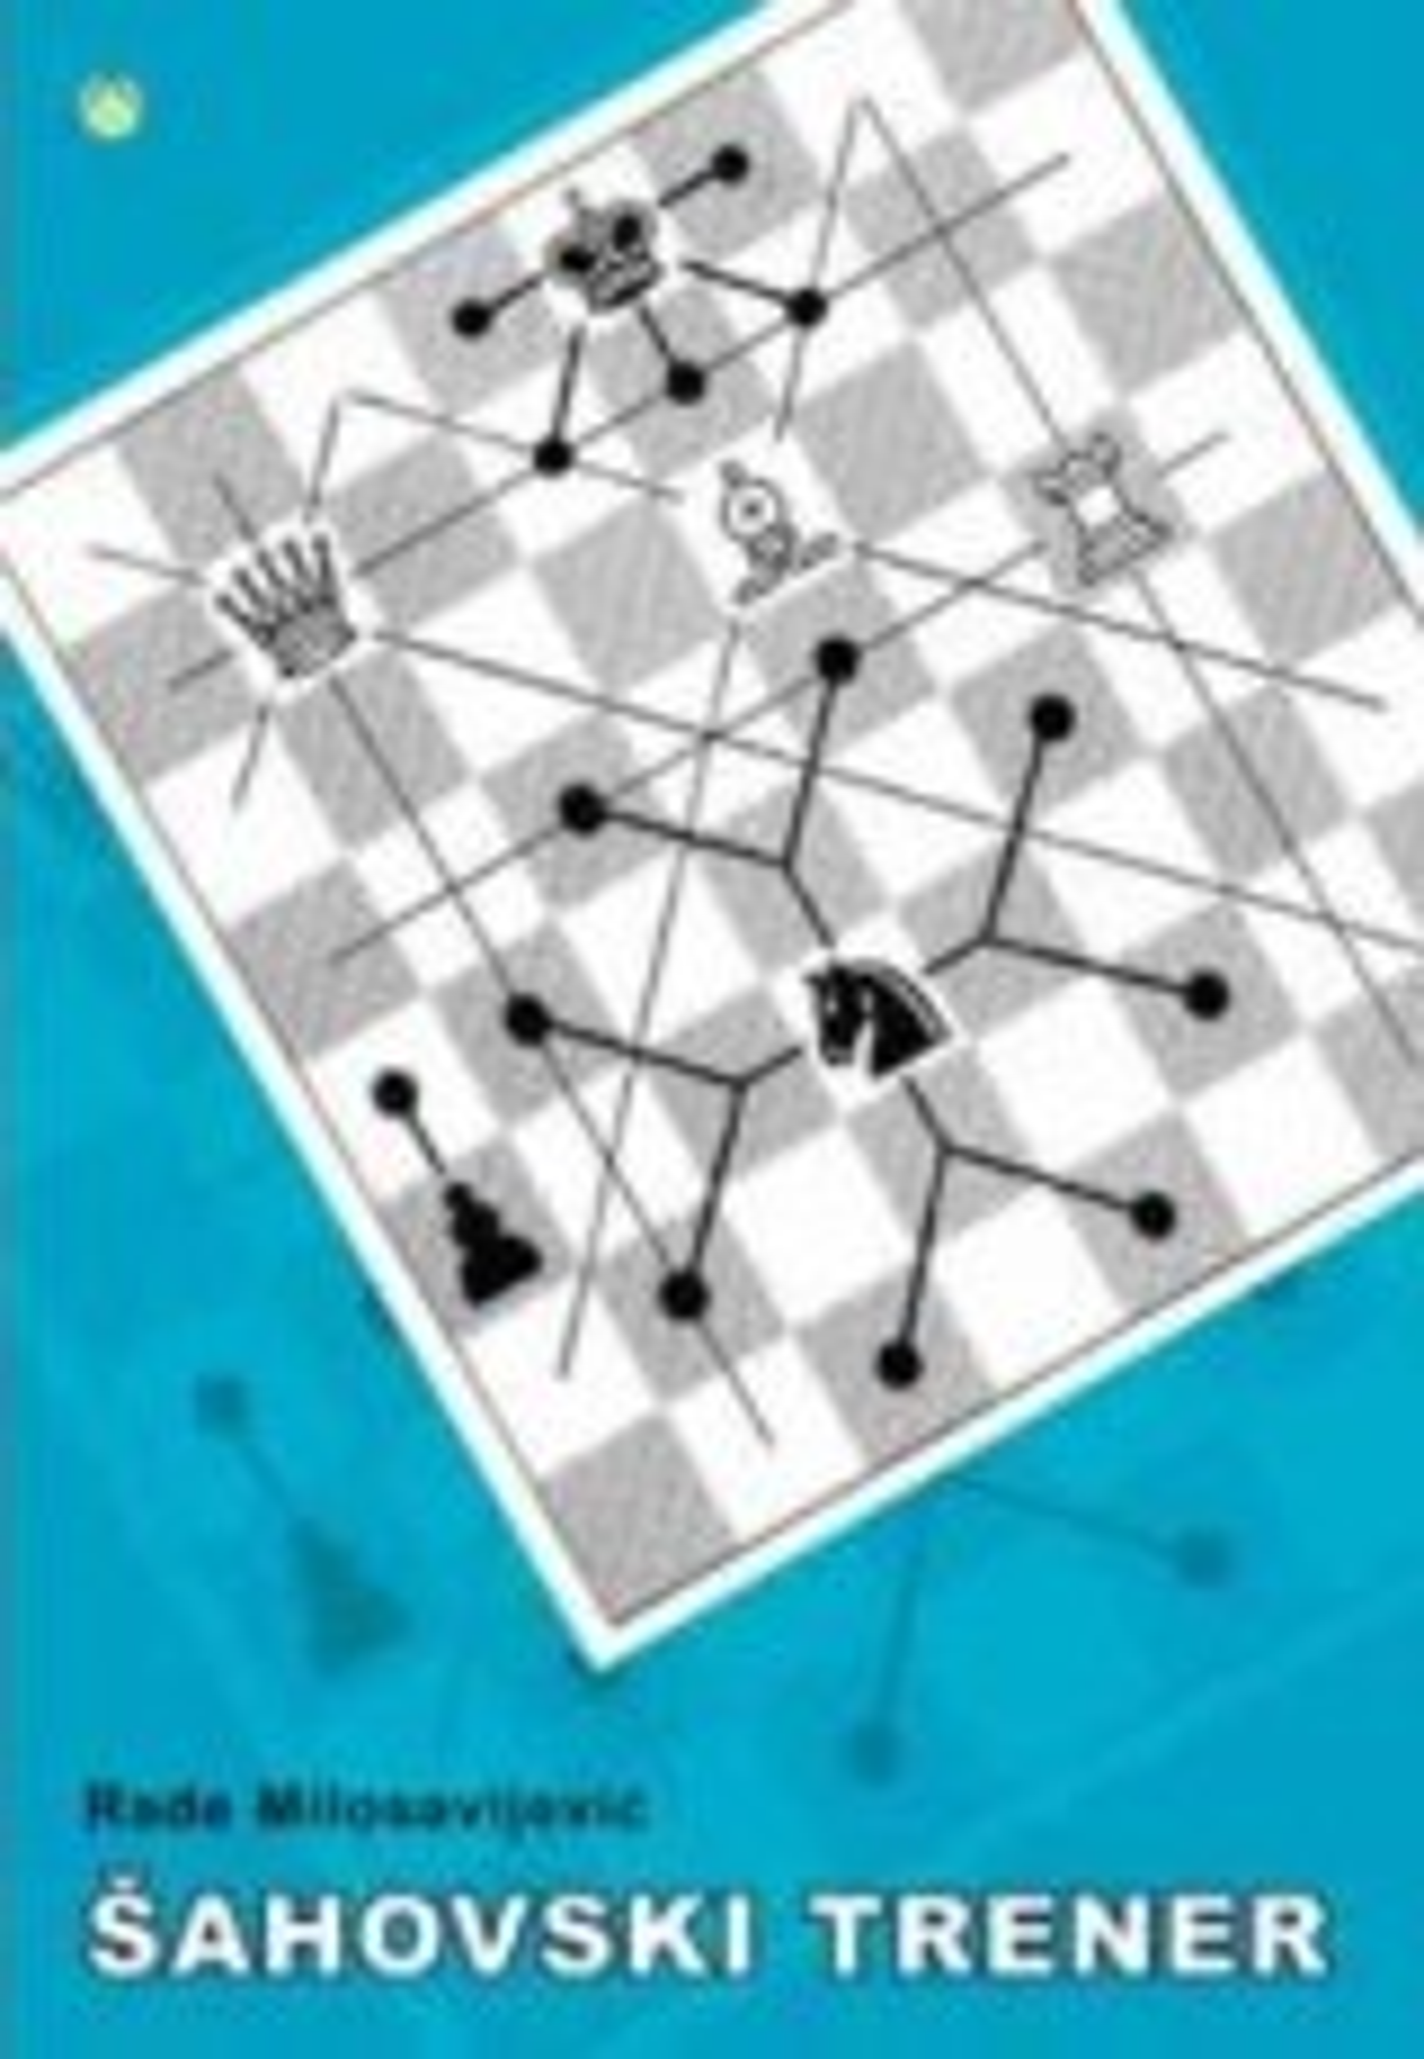 Šahovski trener